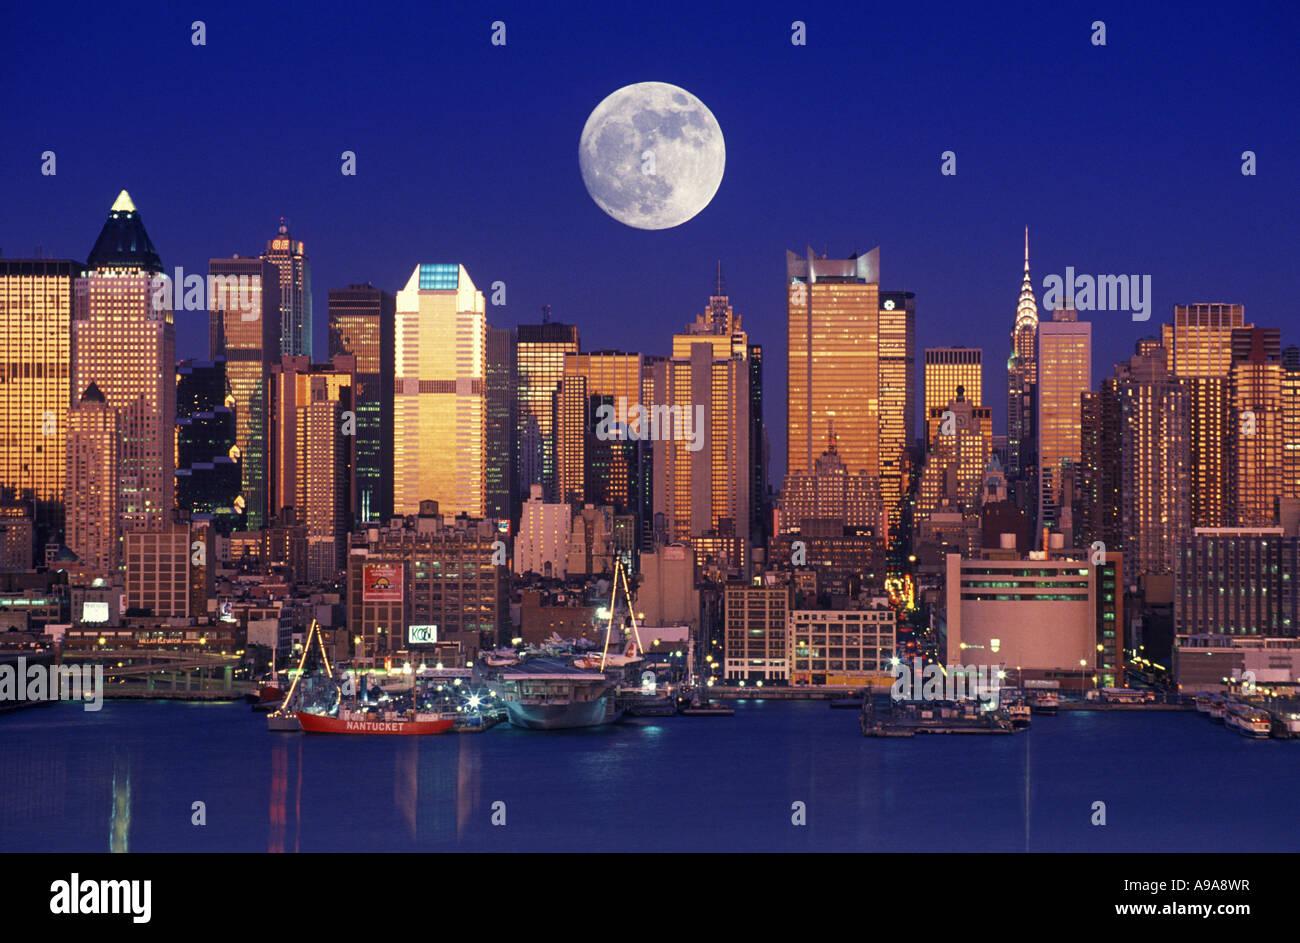 Springs First Full Moon Rises Over New York City Skyline PHOTOS